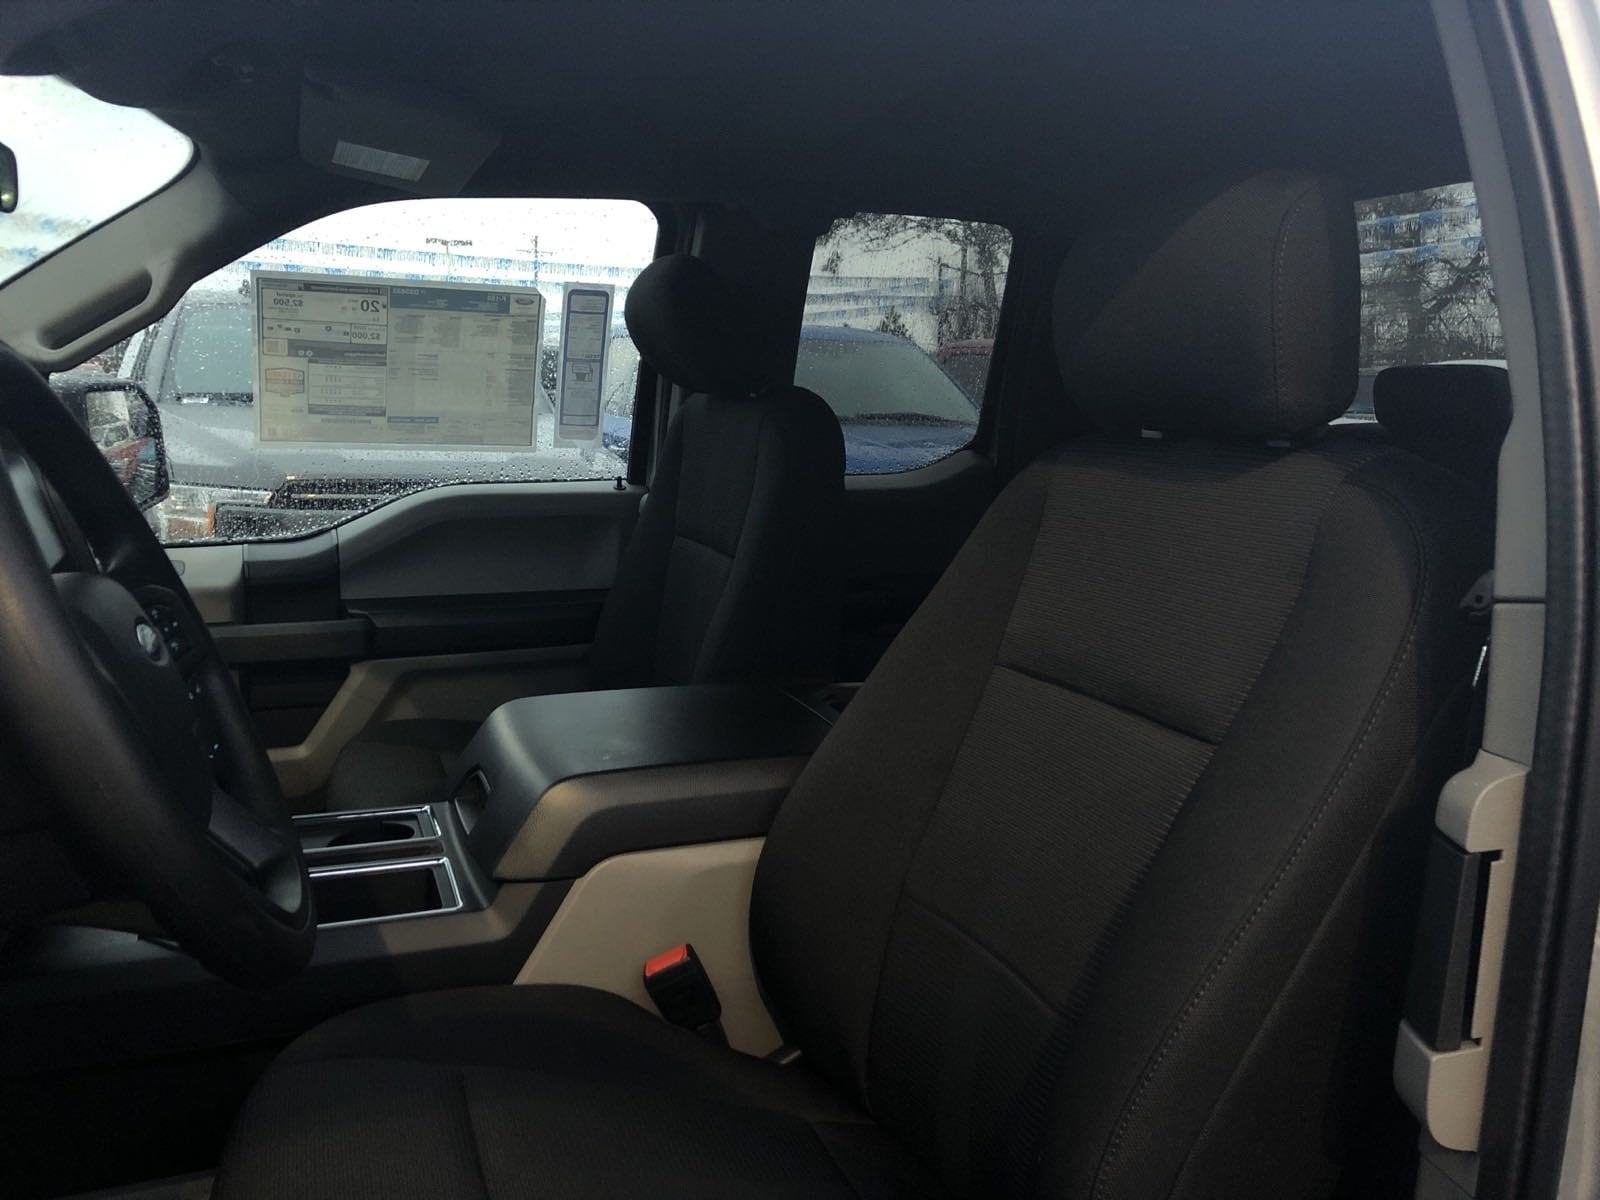 2020 F-150 Super Cab 4x4, Pickup #209337 - photo 1